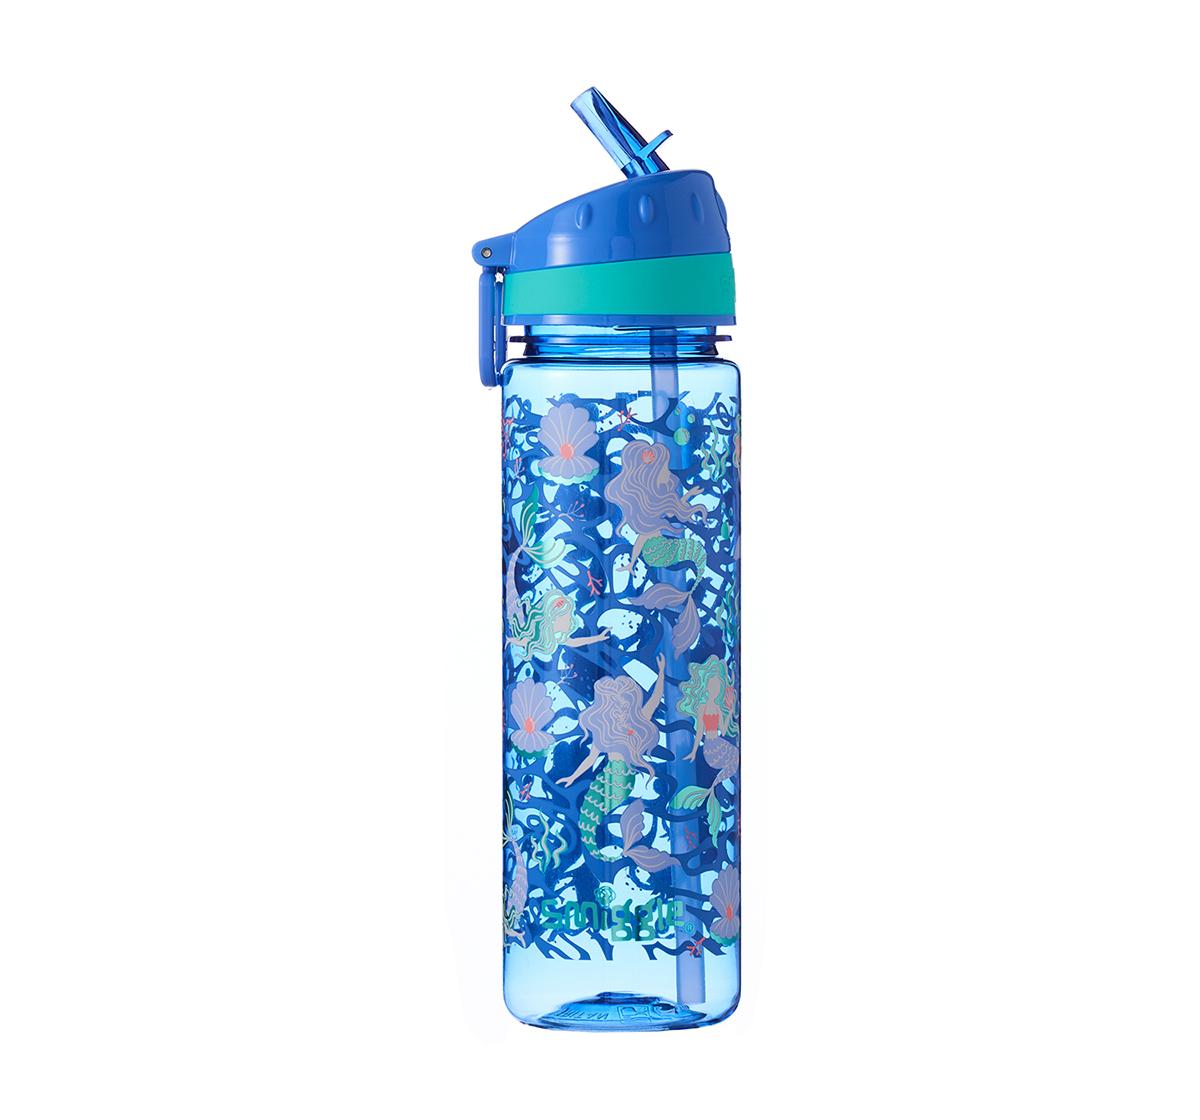 Smiggle |  Smiggle Flow Drink Bottle with Flip Top Spout Mermaid Print Bags for Kids age 3Y+ (Cornflower Blue)